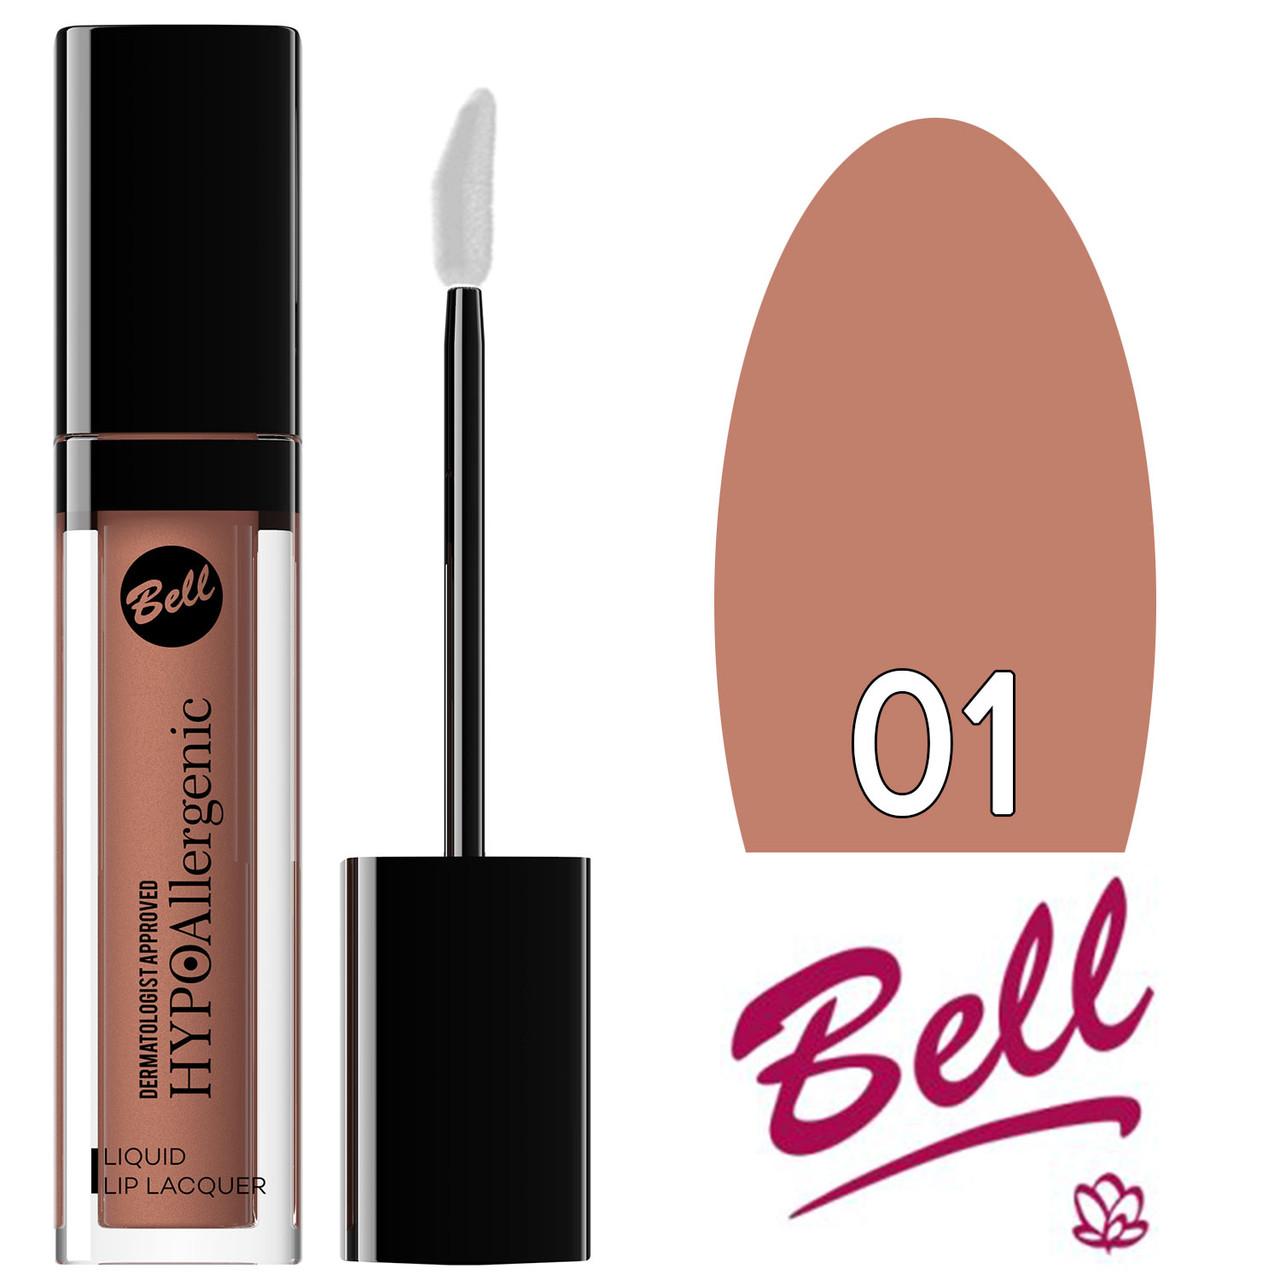 Bell HypoAllergenic - Блеск-лак для губ Liquid Lip Lacquer (гипоал.) Тон №01 cappuccino лаковый